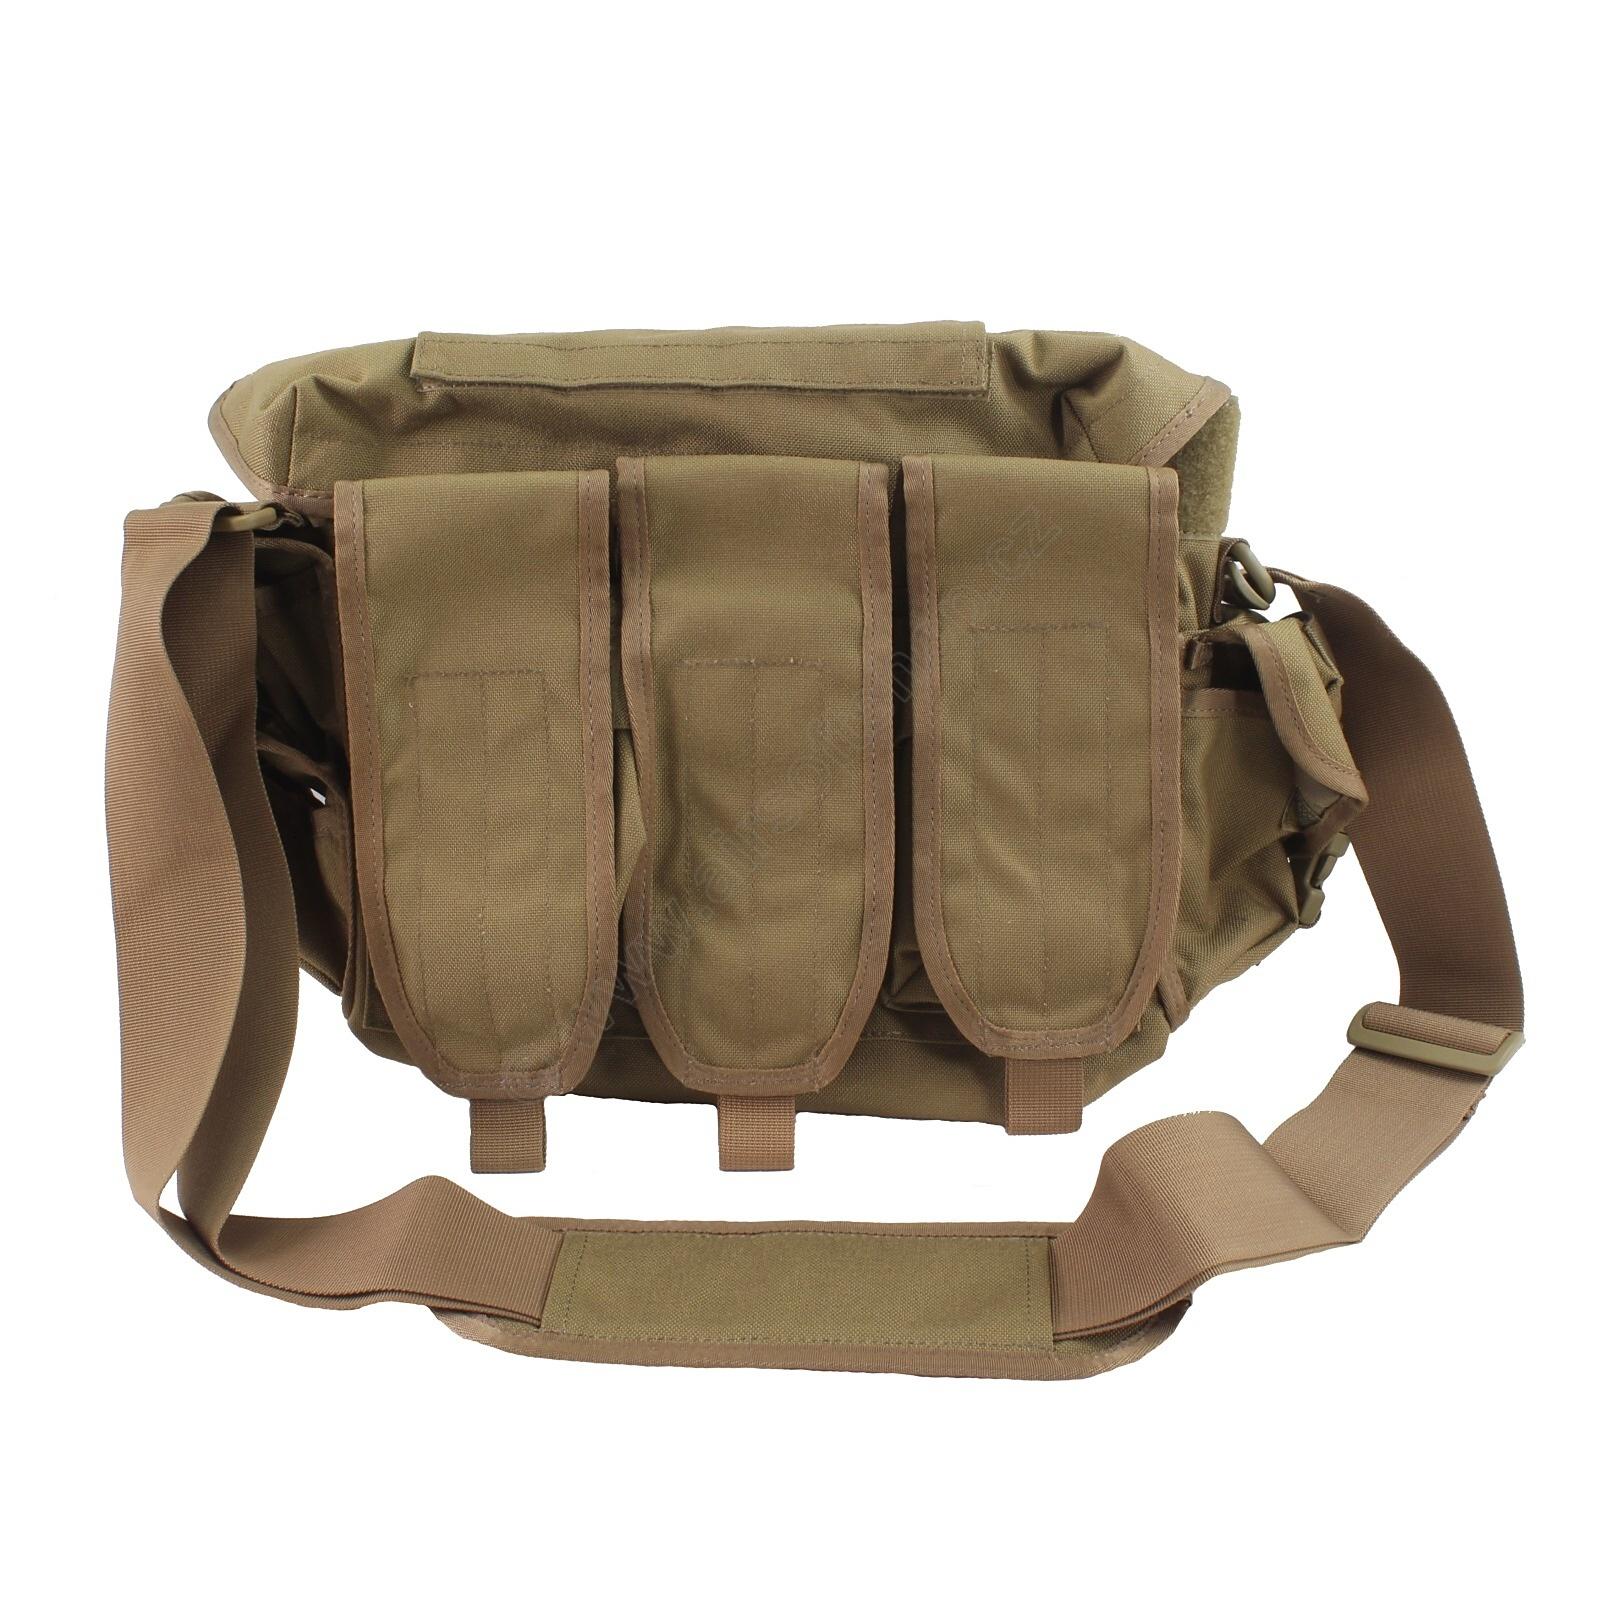 ACM Tactical Ammunition shoulder bag grab bag - TAN